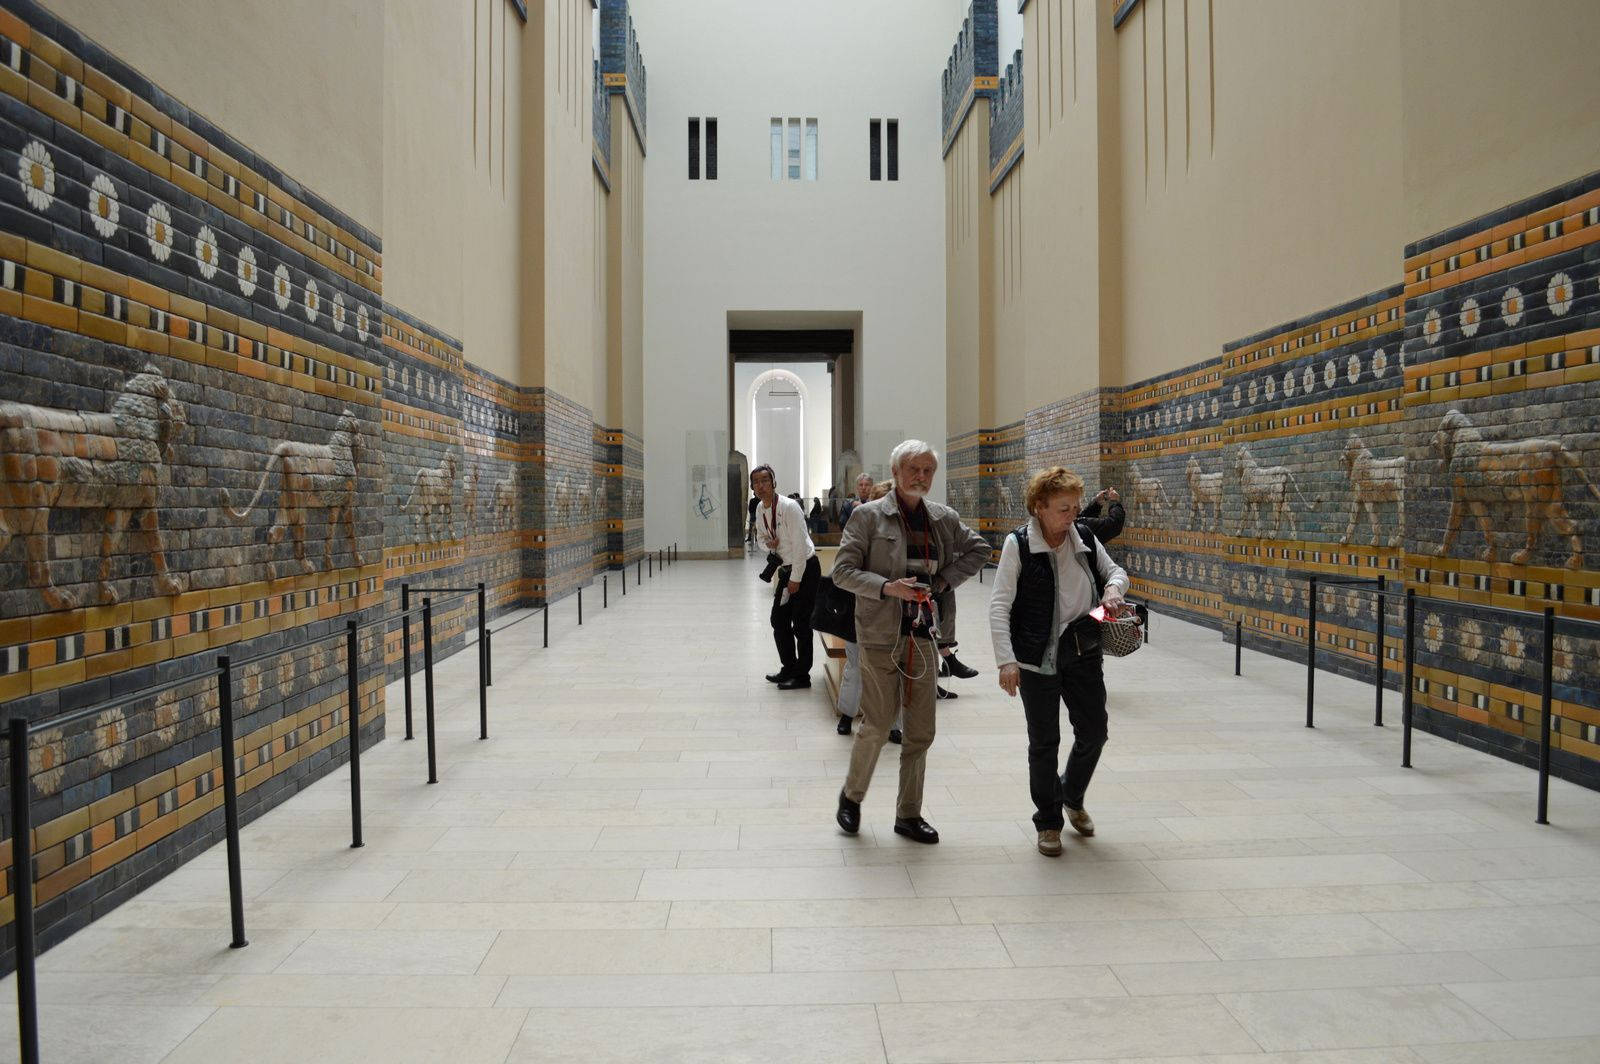 Pergamon museum: de Berlin à Babylone